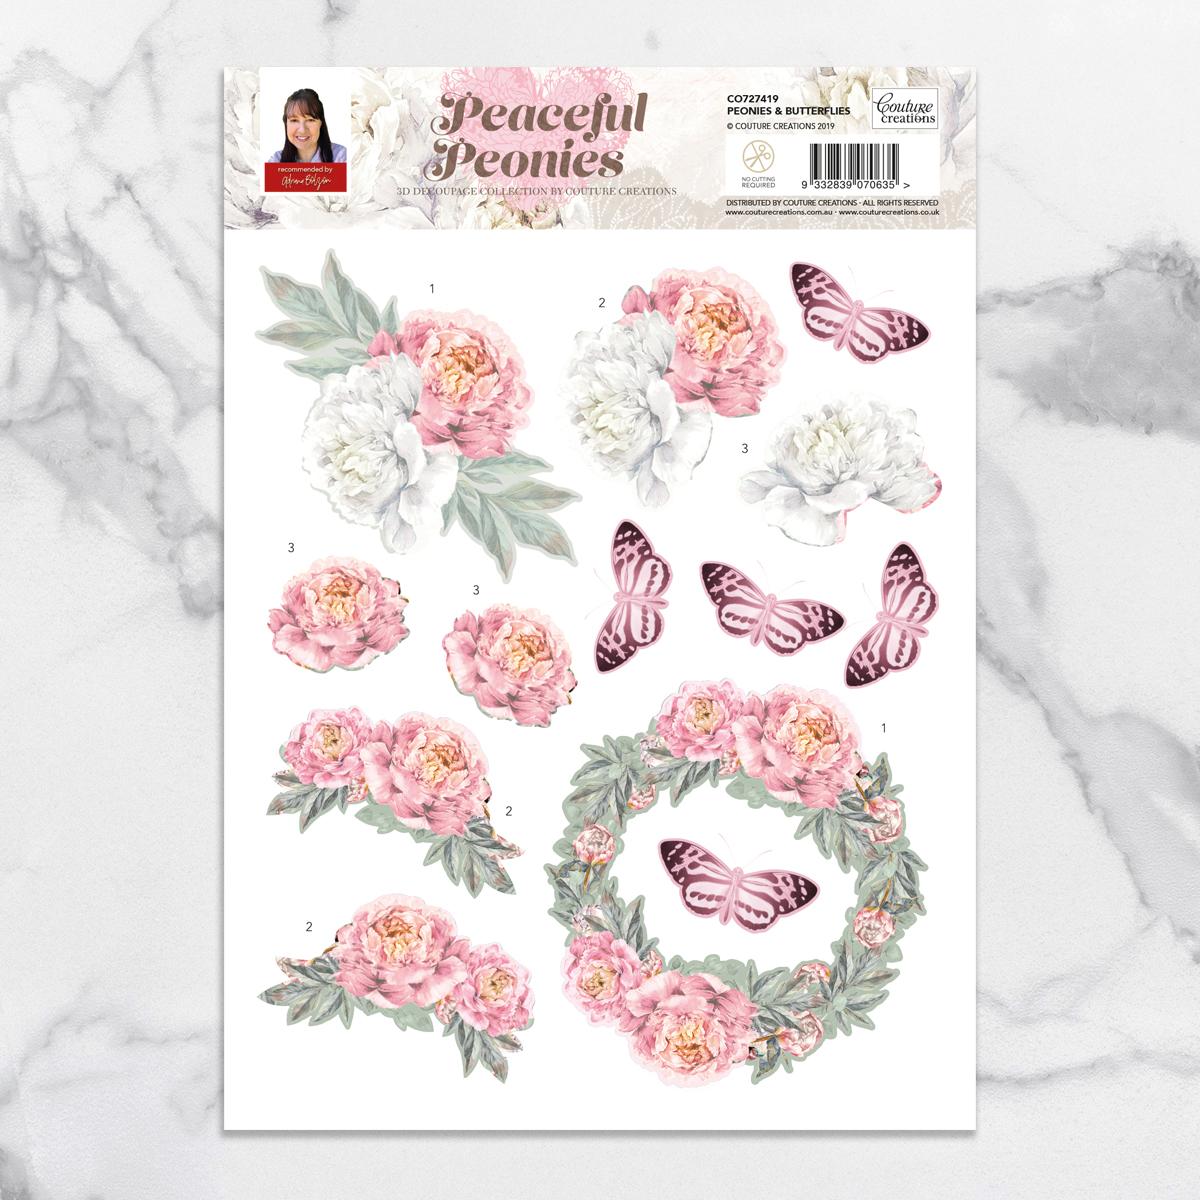 Couture Creations - Peaceful Peonies - Peonies & Butterflies